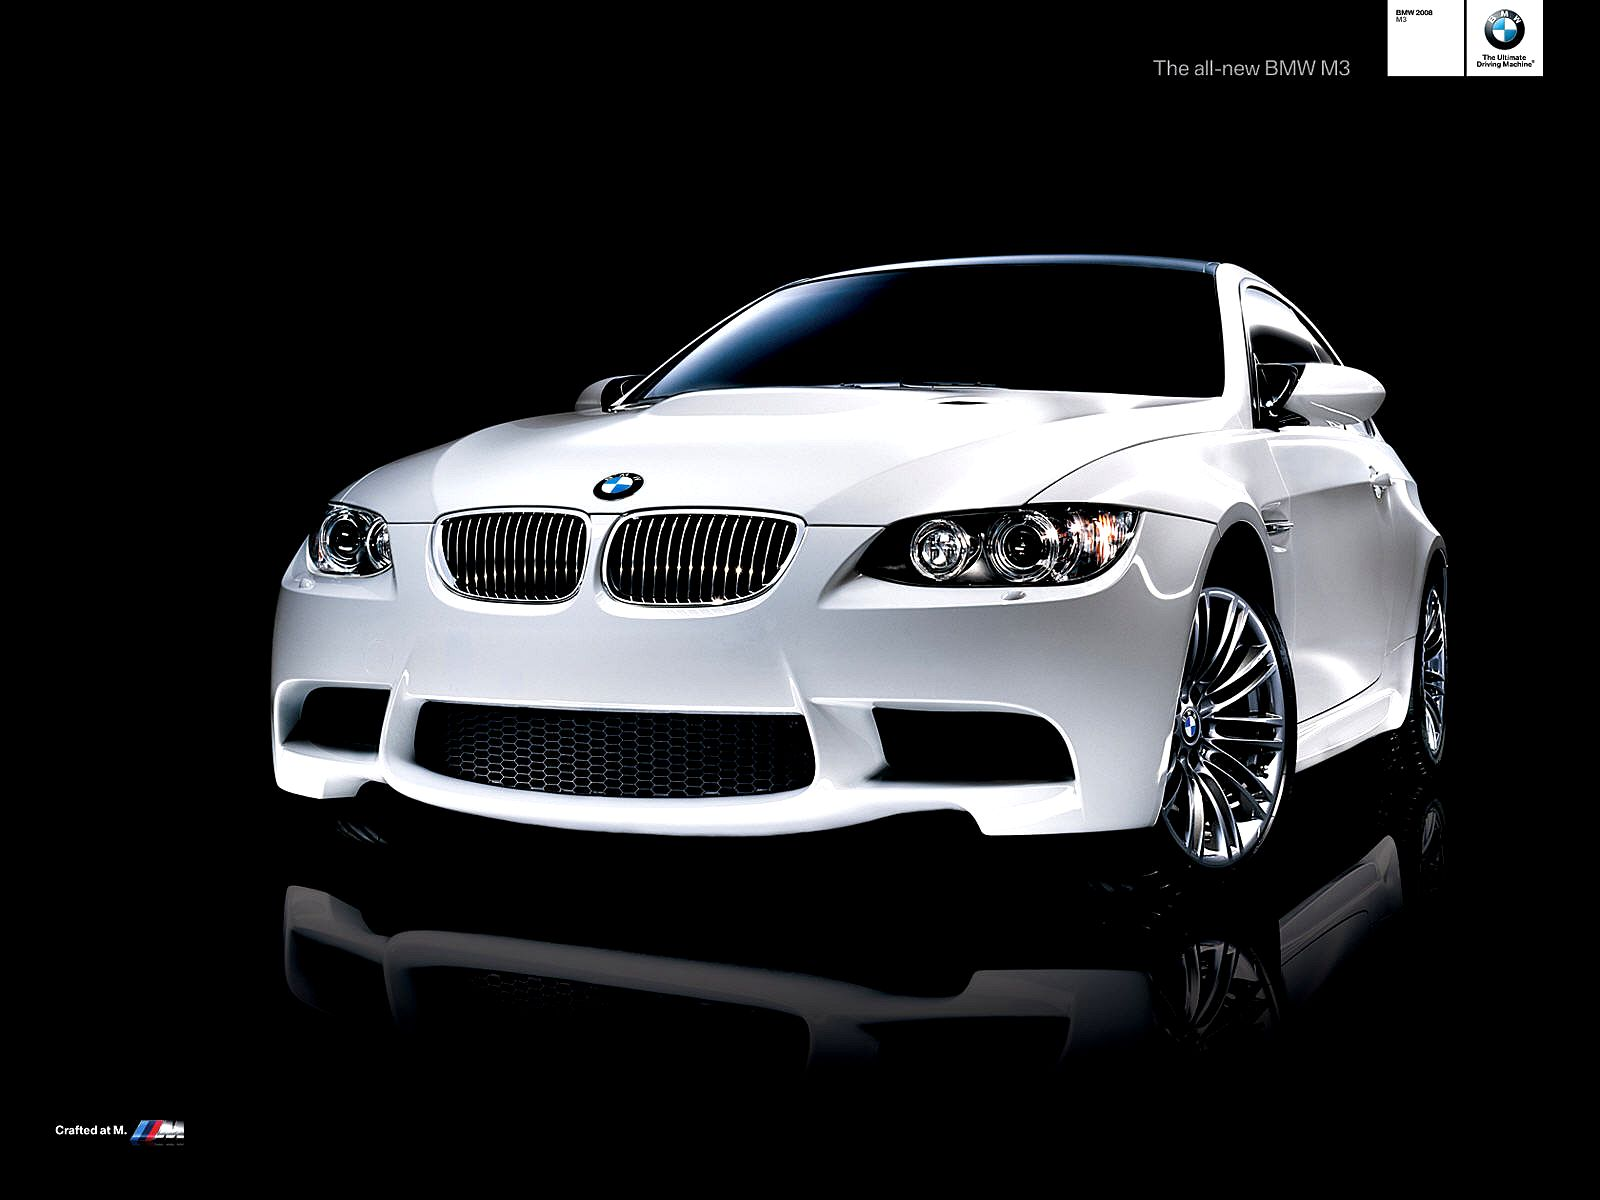 http://3.bp.blogspot.com/-CjF2kKlT0bA/T8g1wMPj3RI/AAAAAAAAA3s/nFBaYw_YClA/s1600/170-cars_bmw_m3_wallpaper.jpg